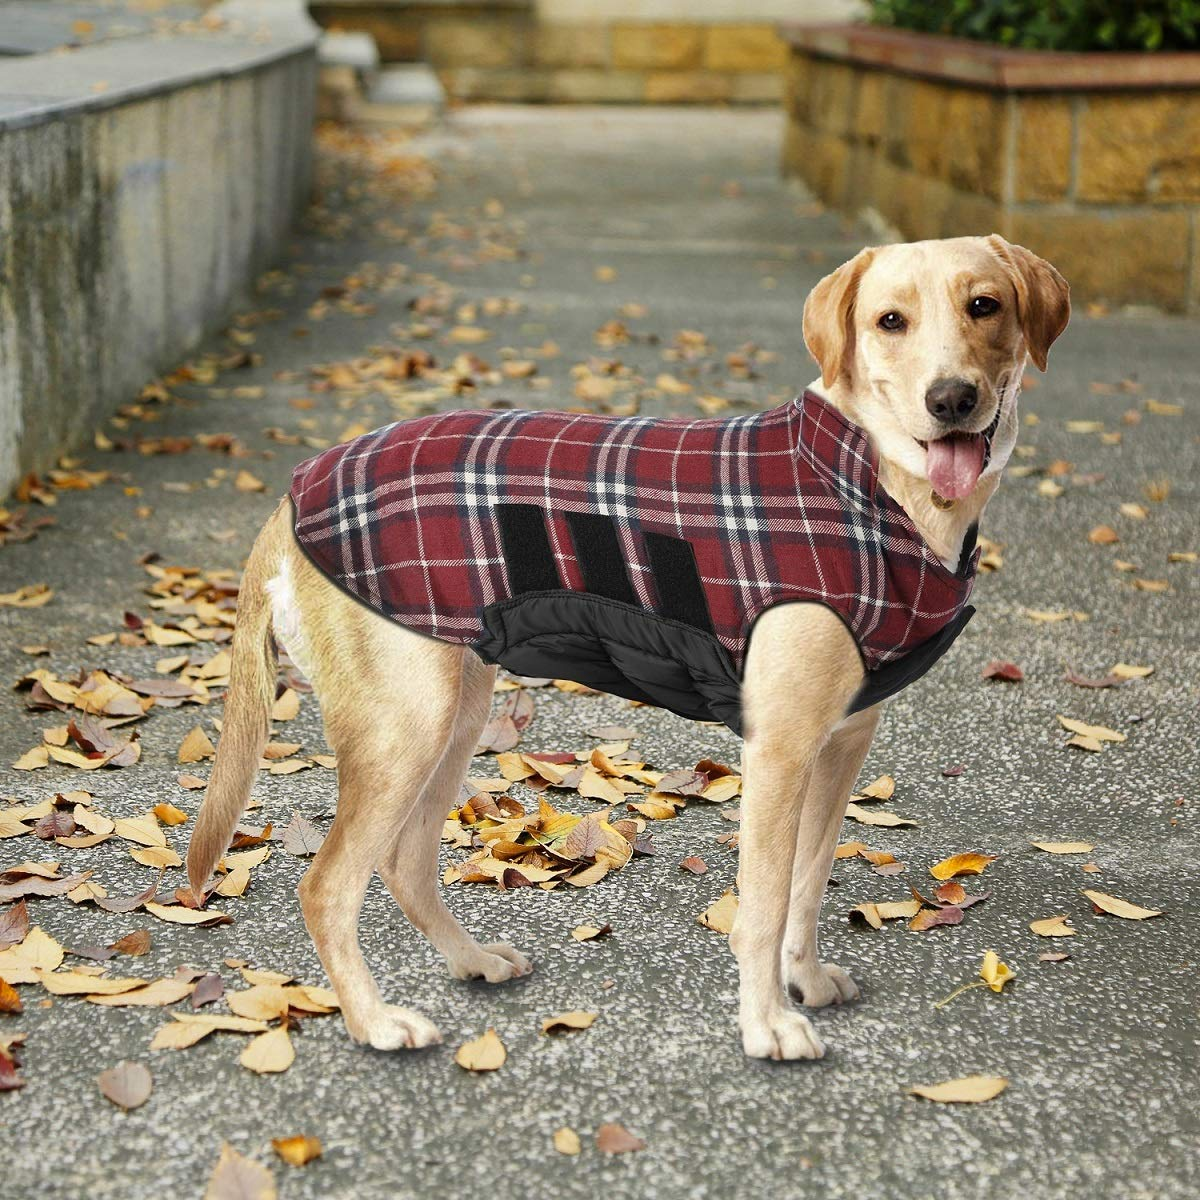 A dog in a plaid coat.